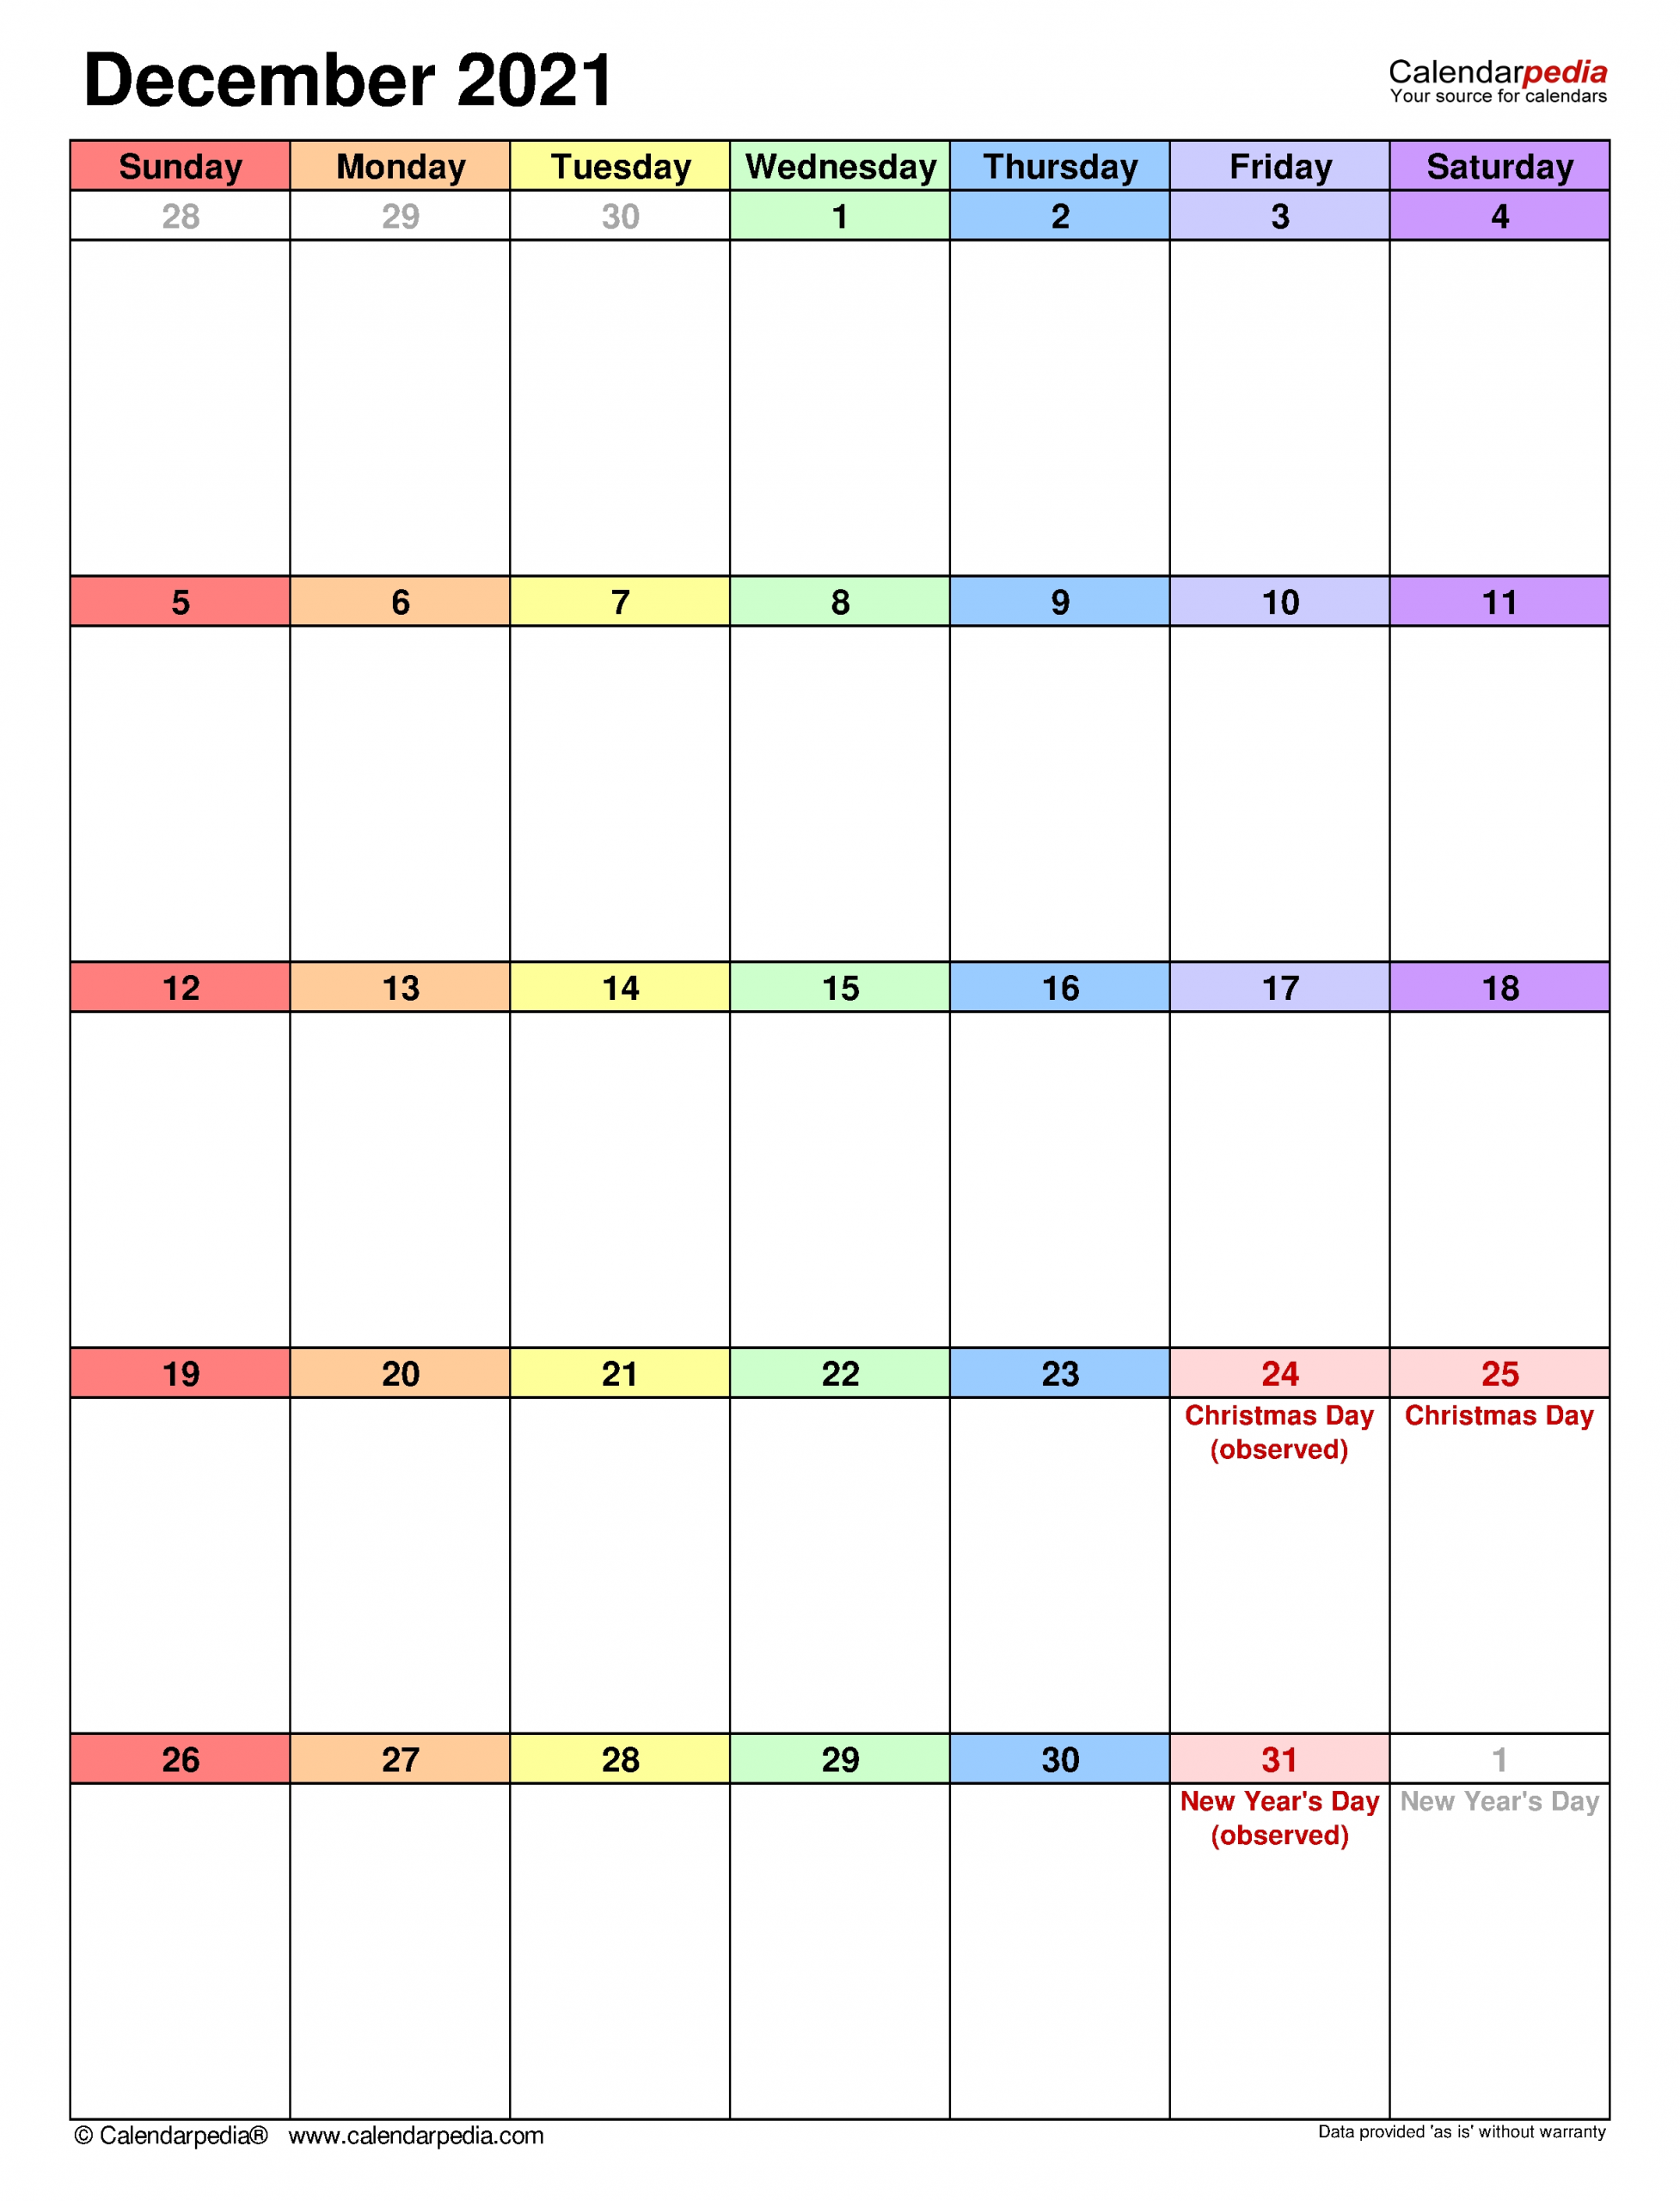 Monthly Calendar December 2021 Photos Download Jpg, Png, Gif